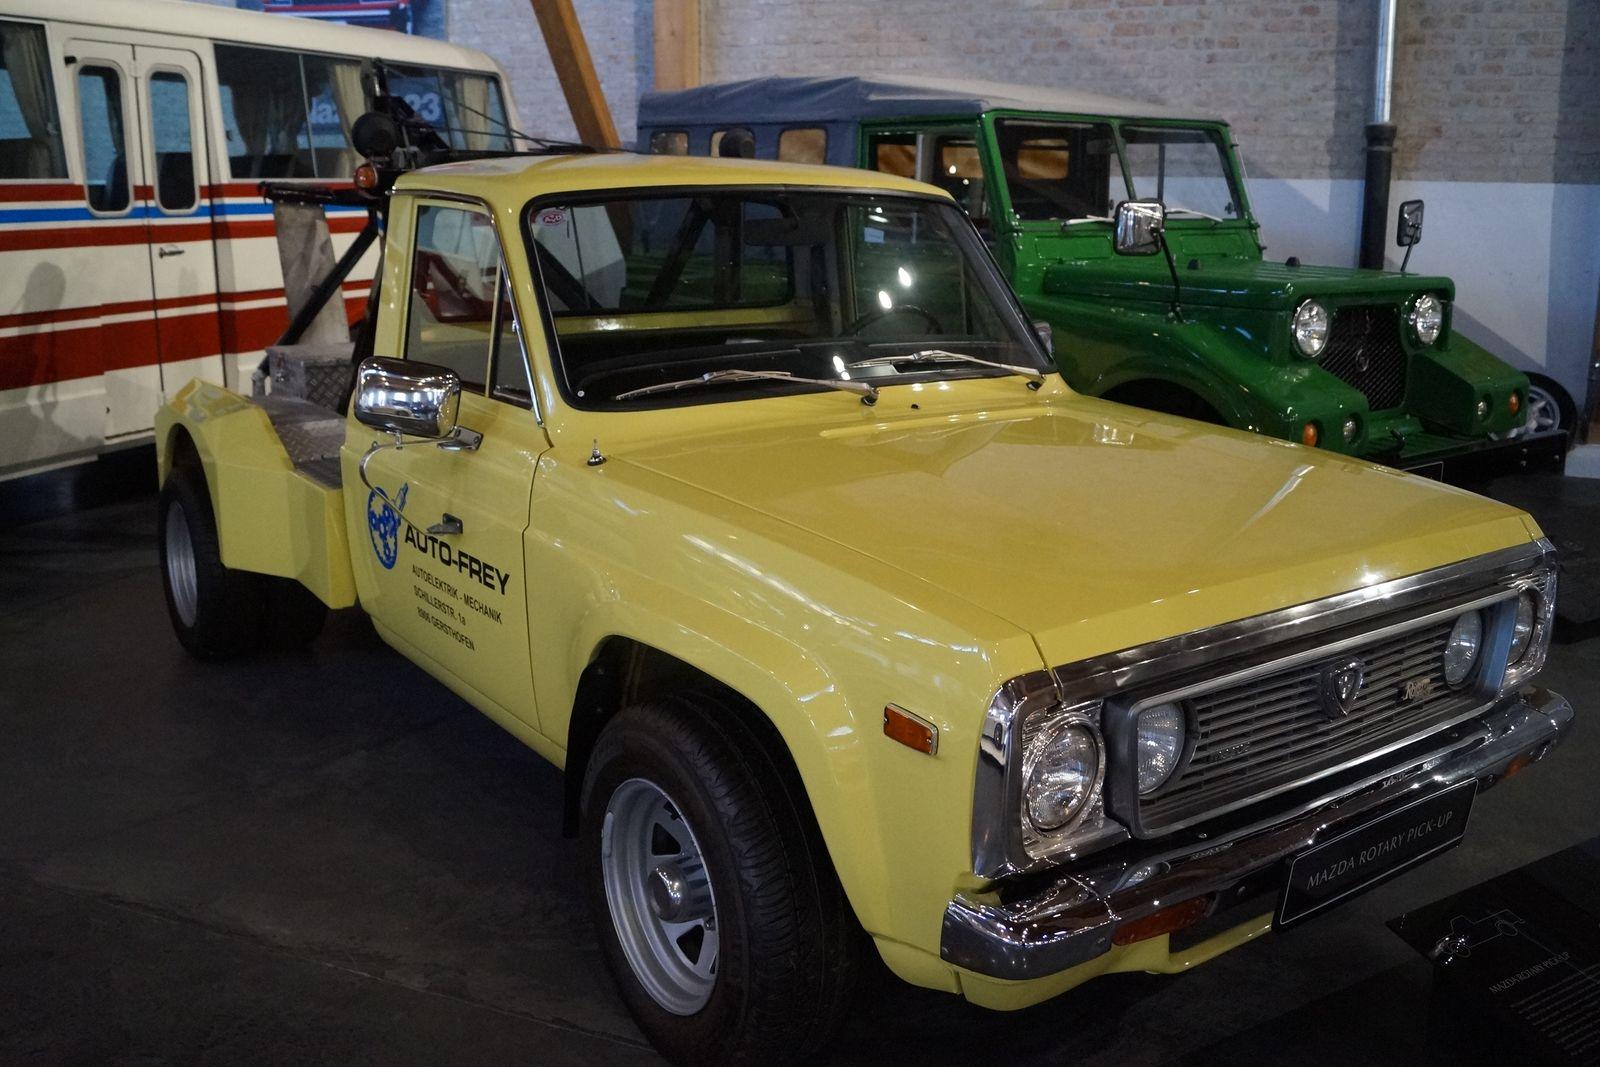 100 Jahre Mazda - Pick Up